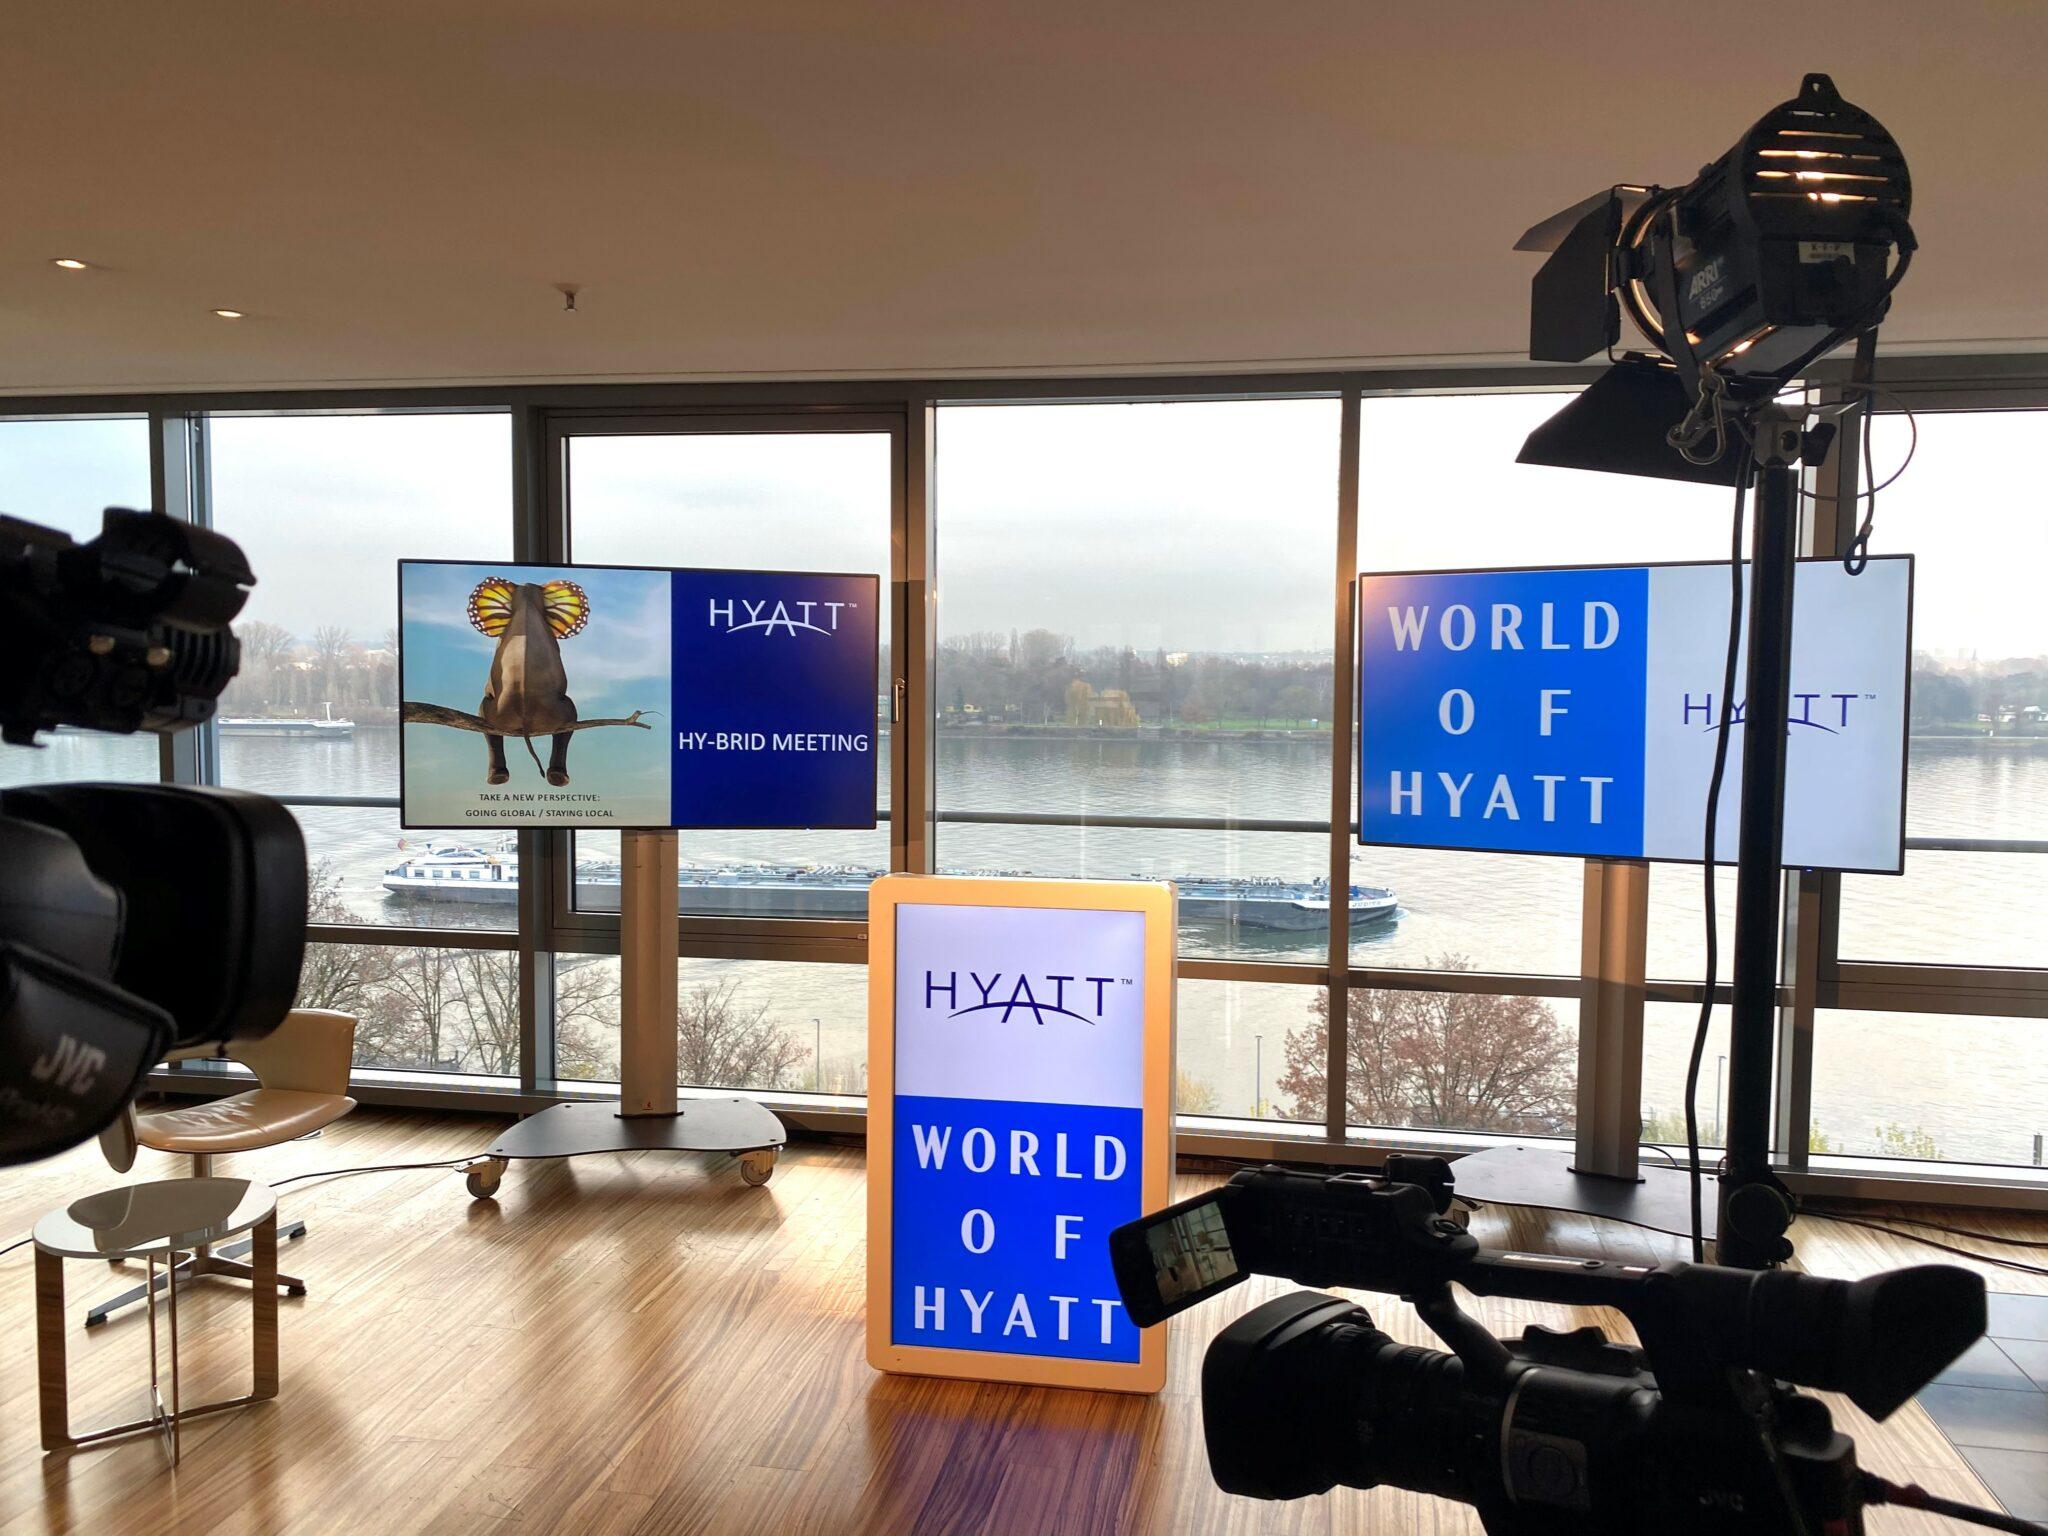 Hyatt Regency Mainz Hybrid Pop-Up Studio